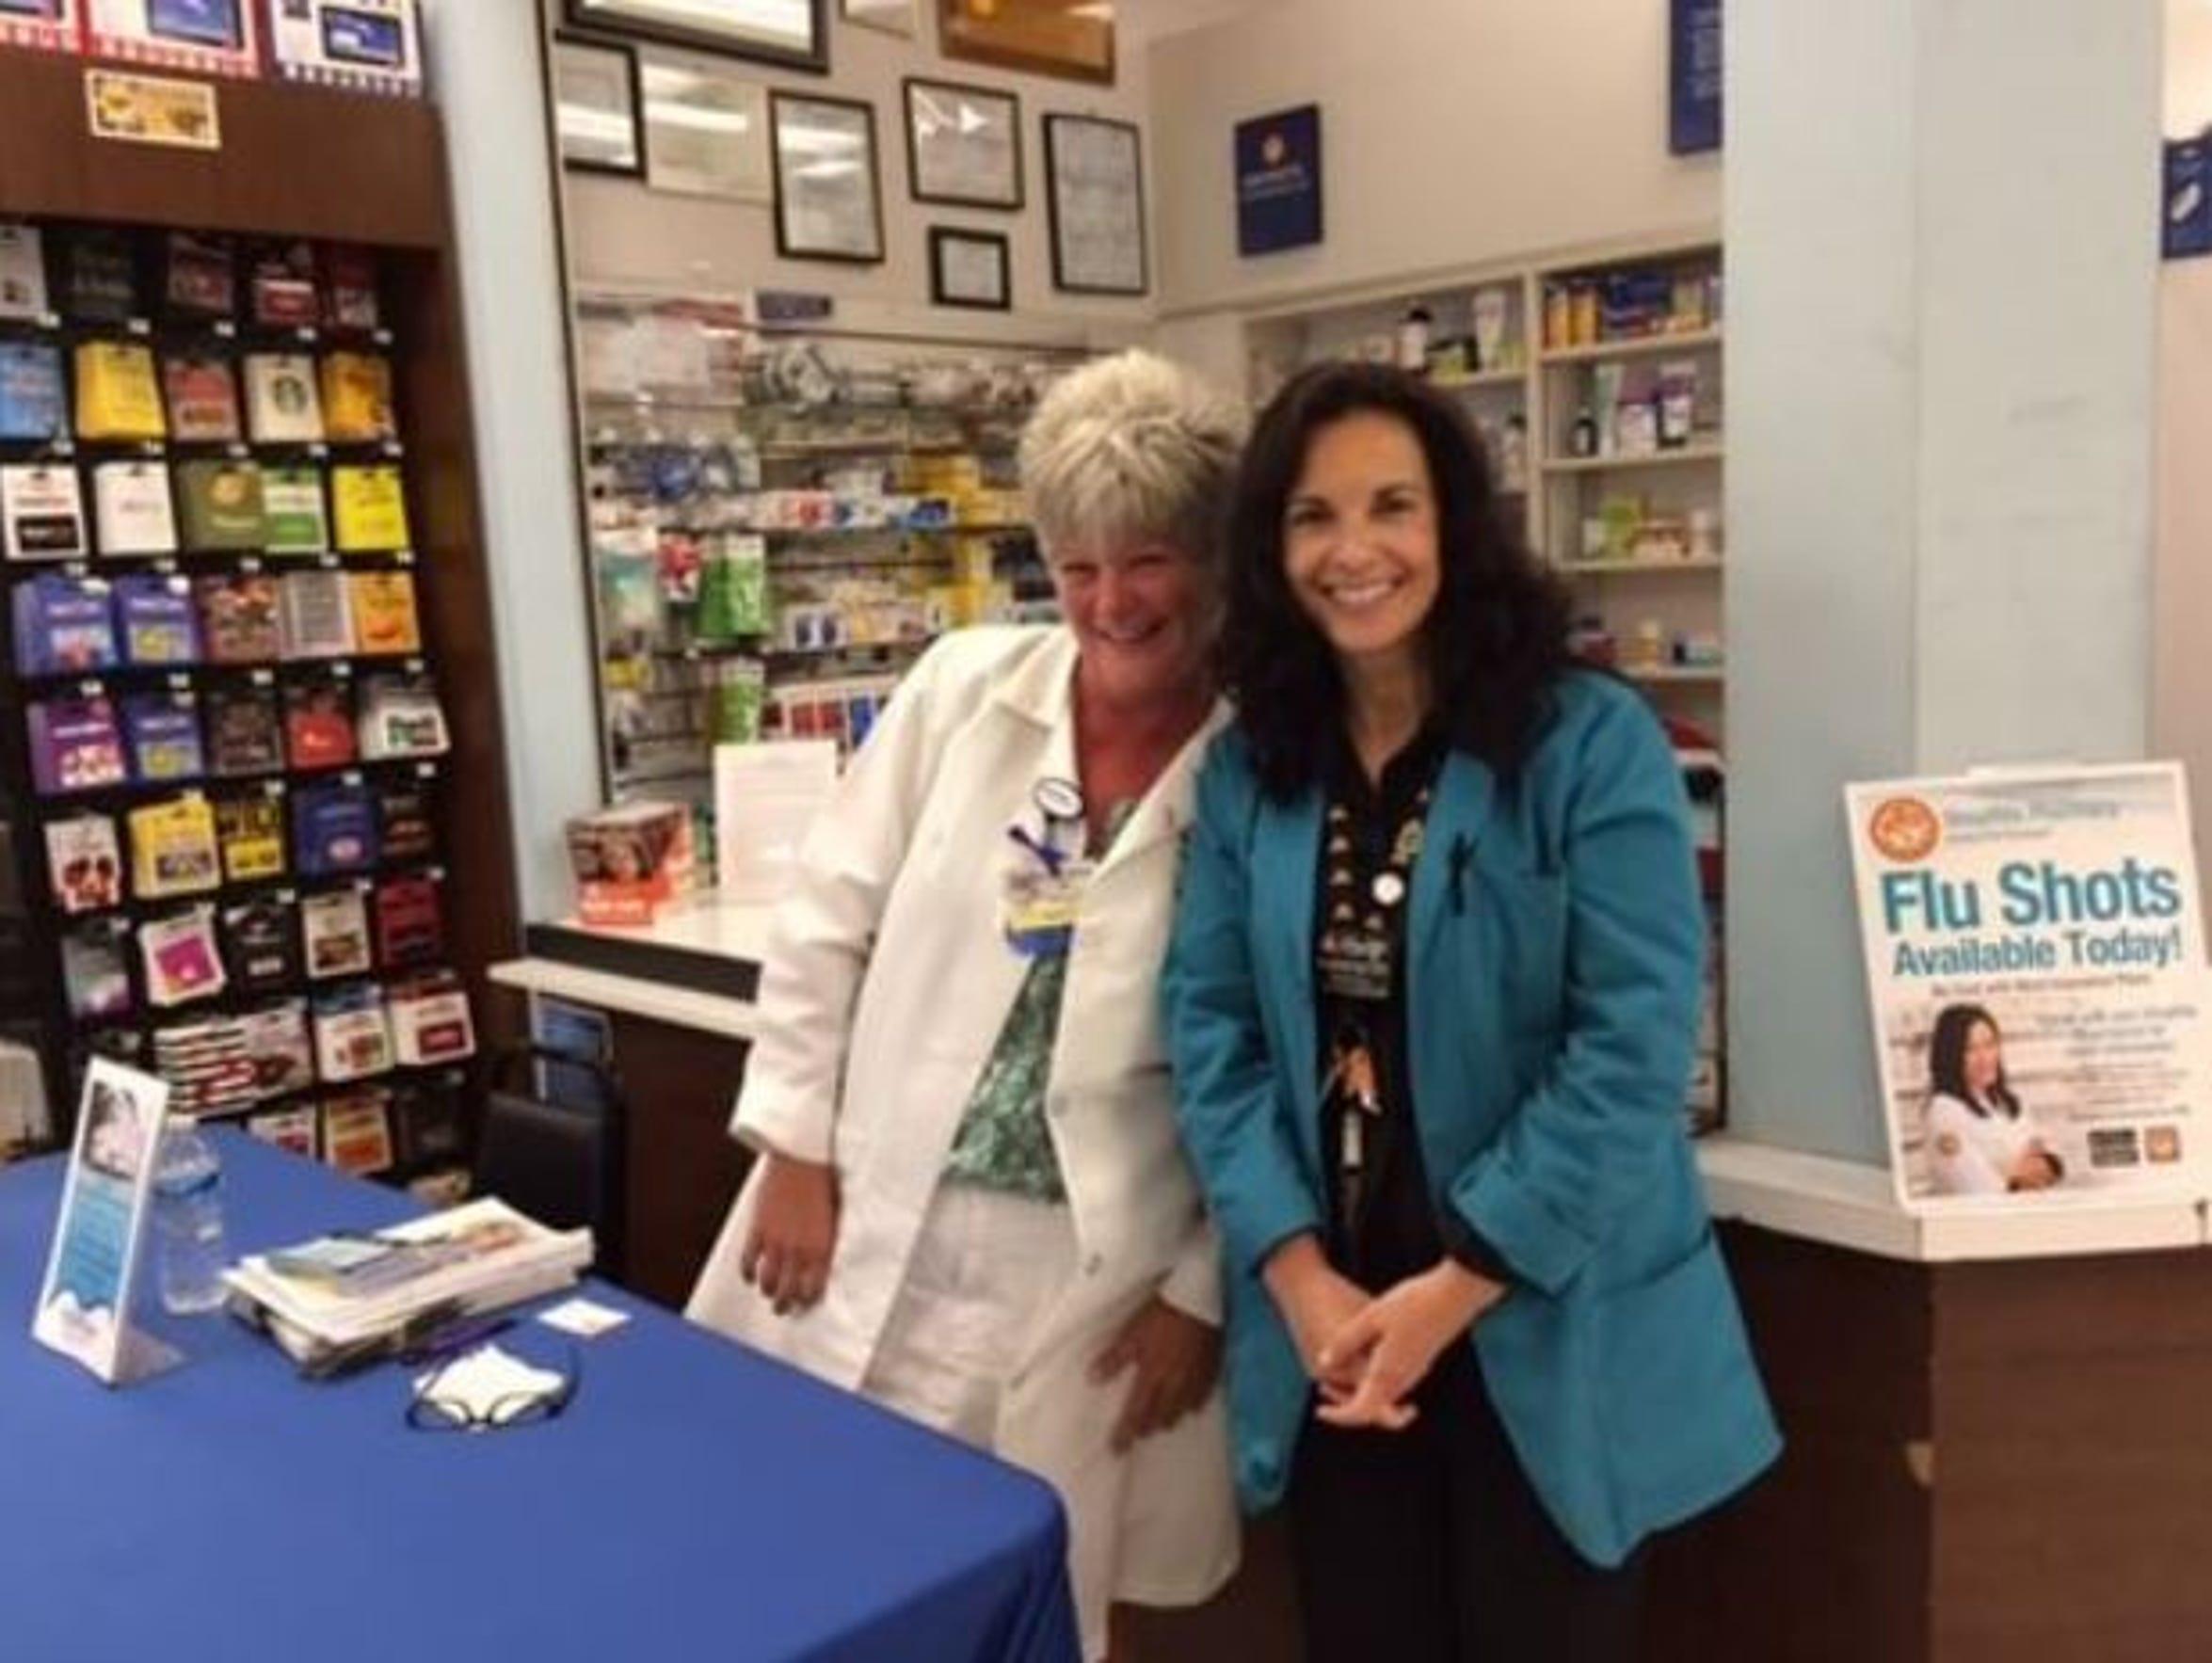 Community Health Services staff provides flu shots